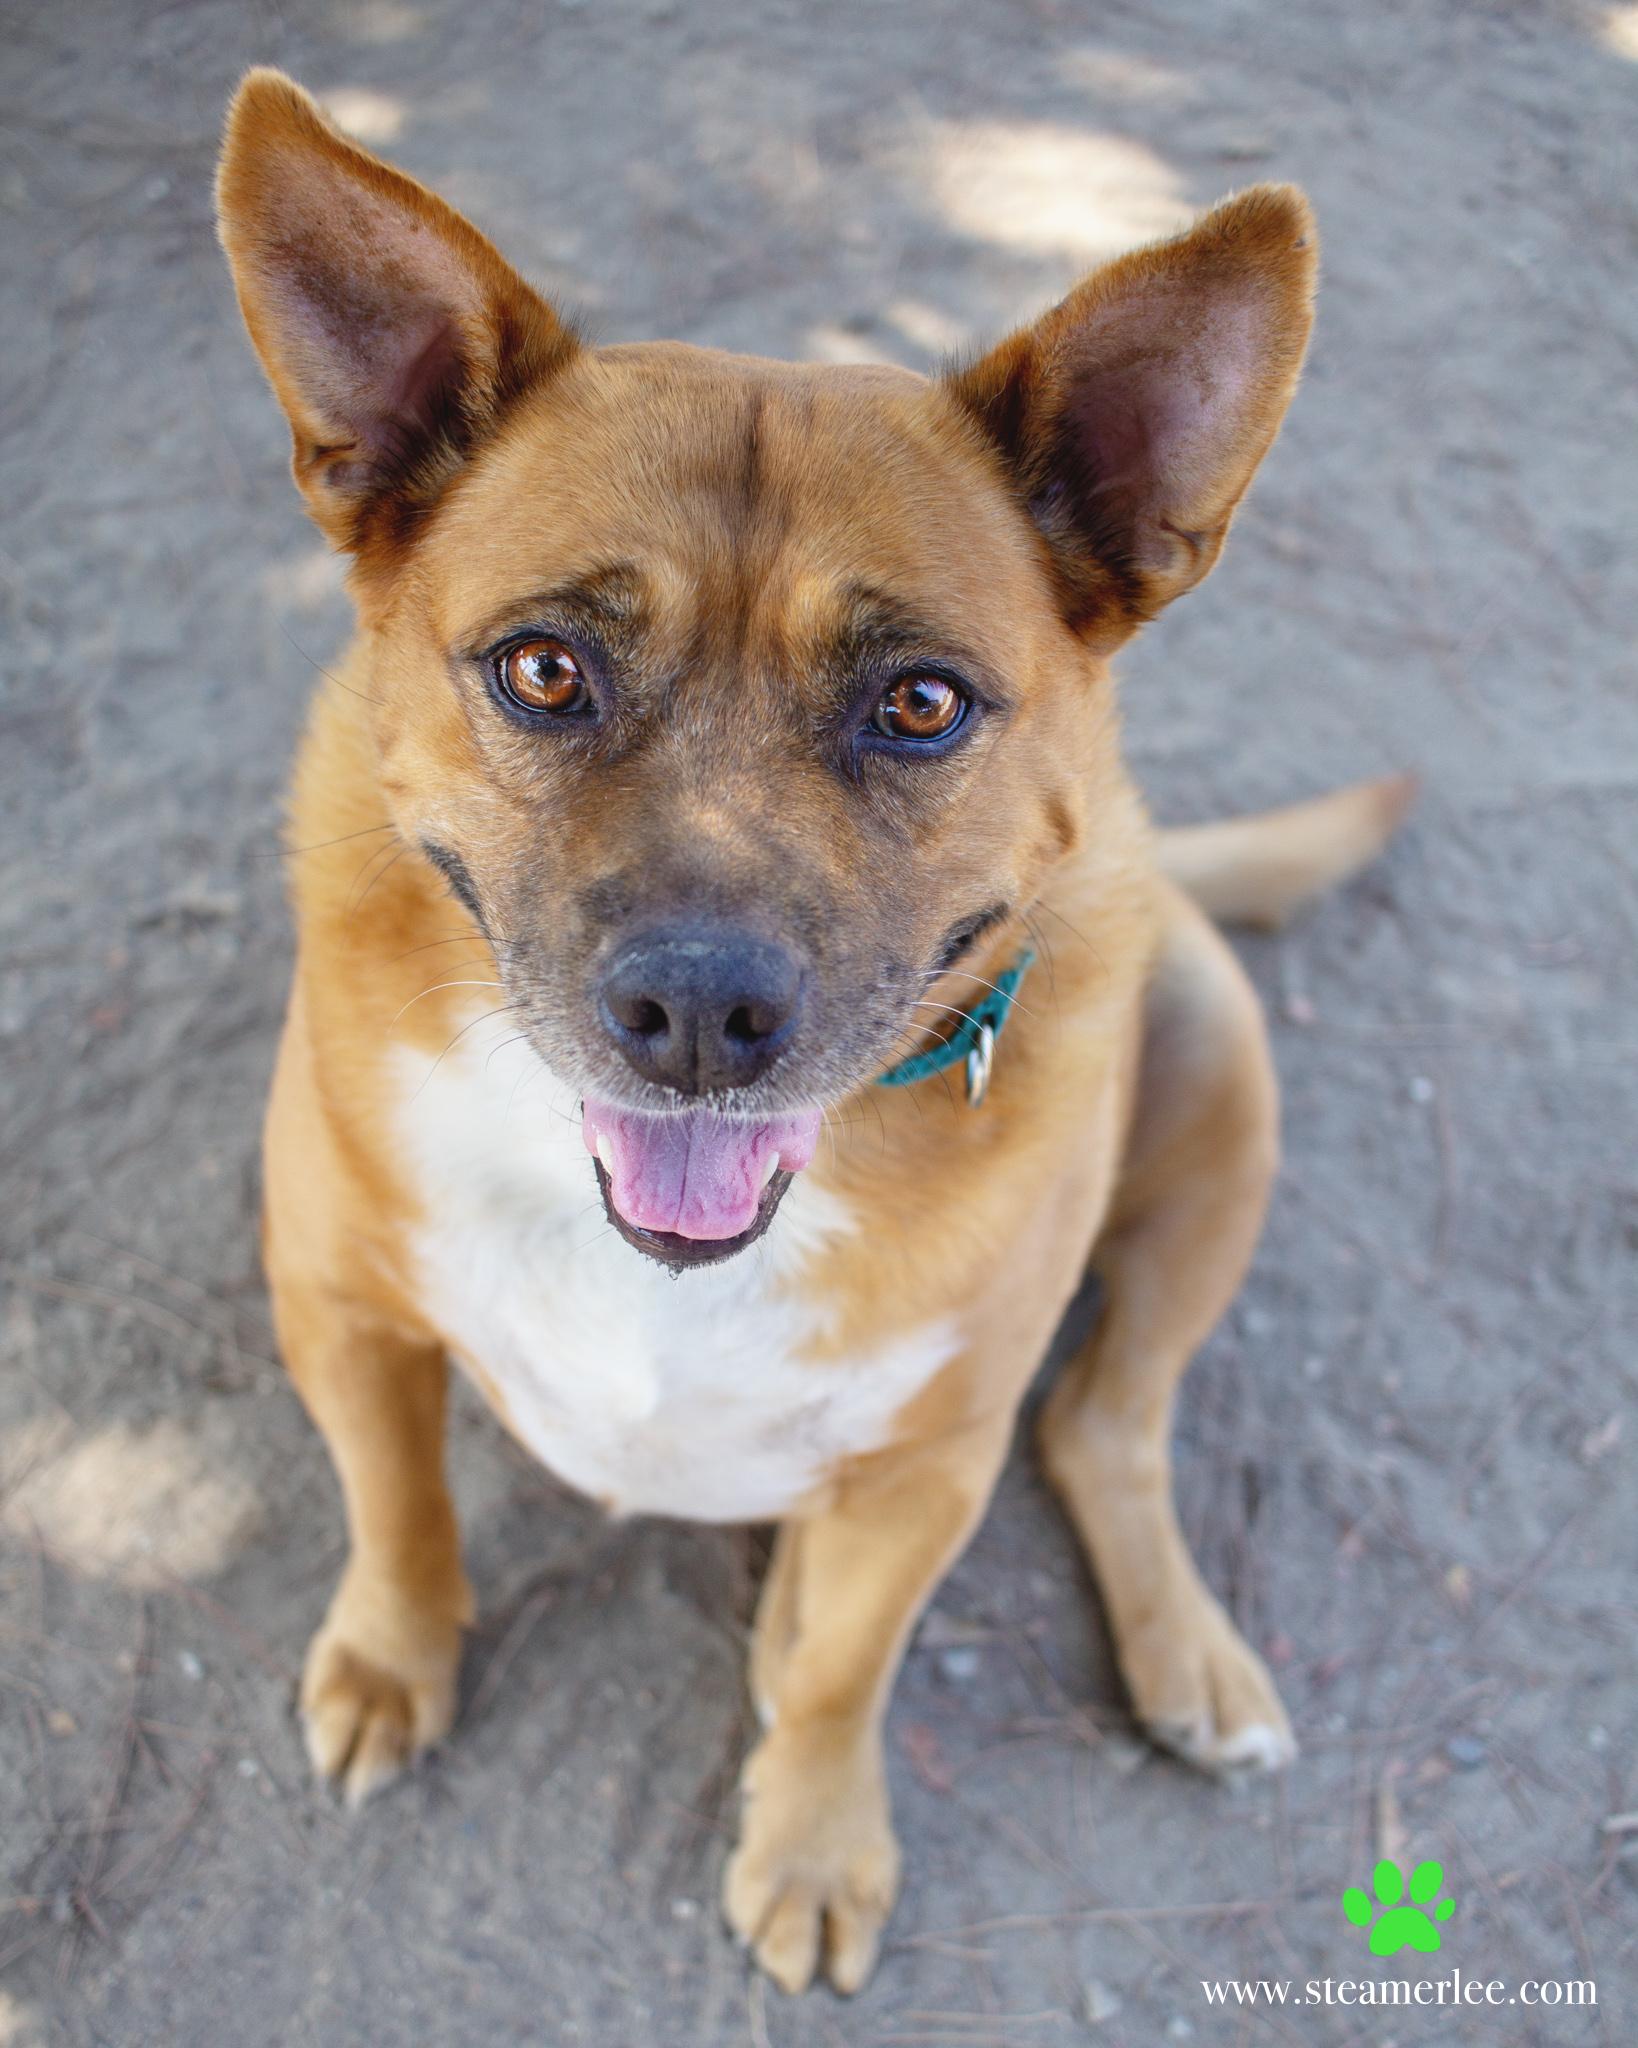 487-Orange-County-Dog-Photography-Steamer-Lee-Southern-California-SBACC.JPG